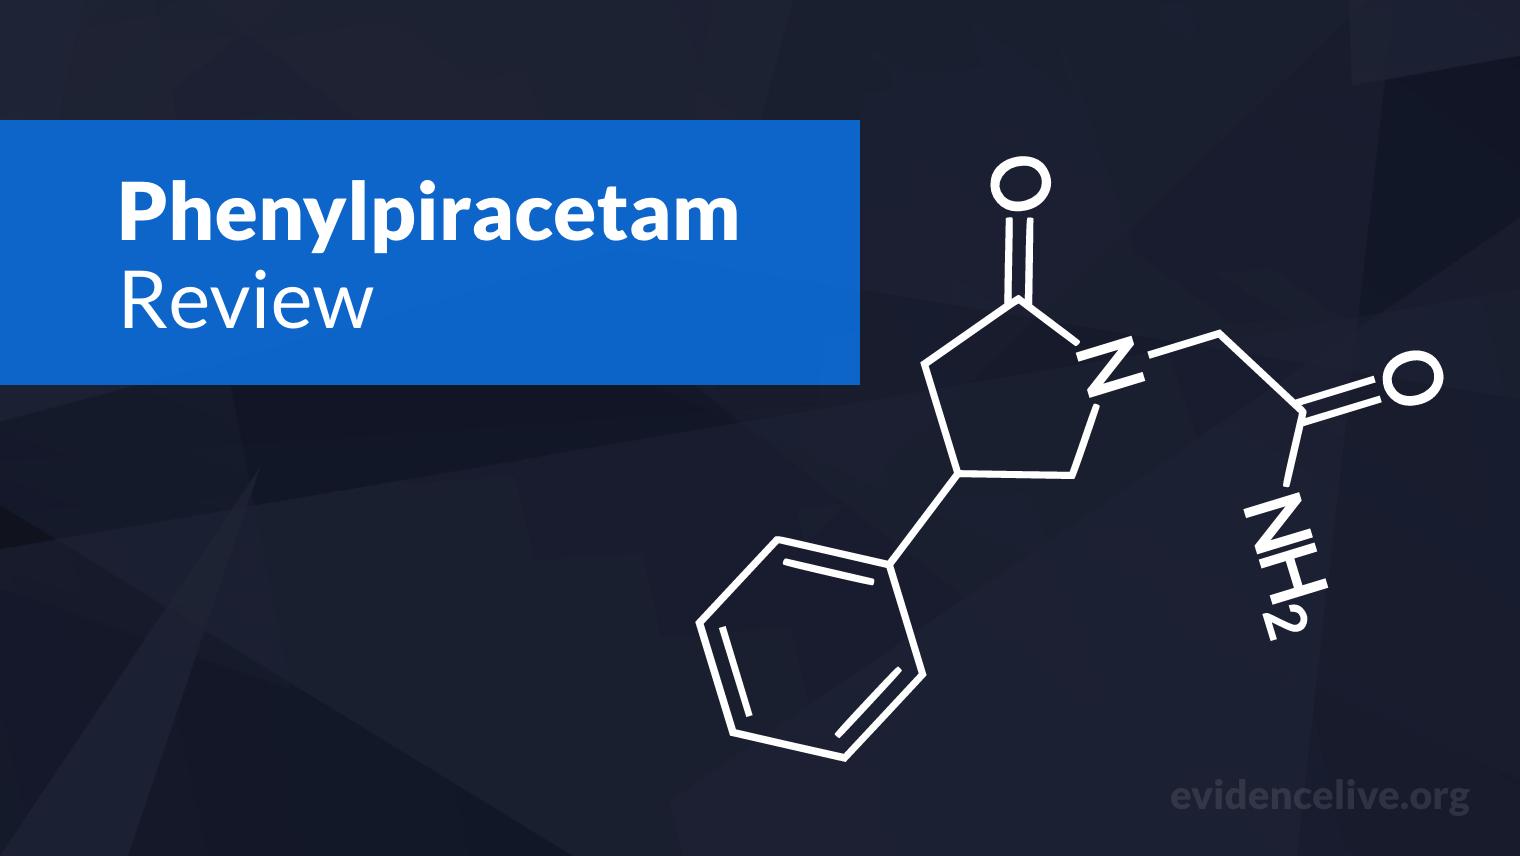 Phenylpiracetam: Benefits, Uses, Dosage, and Side Effects